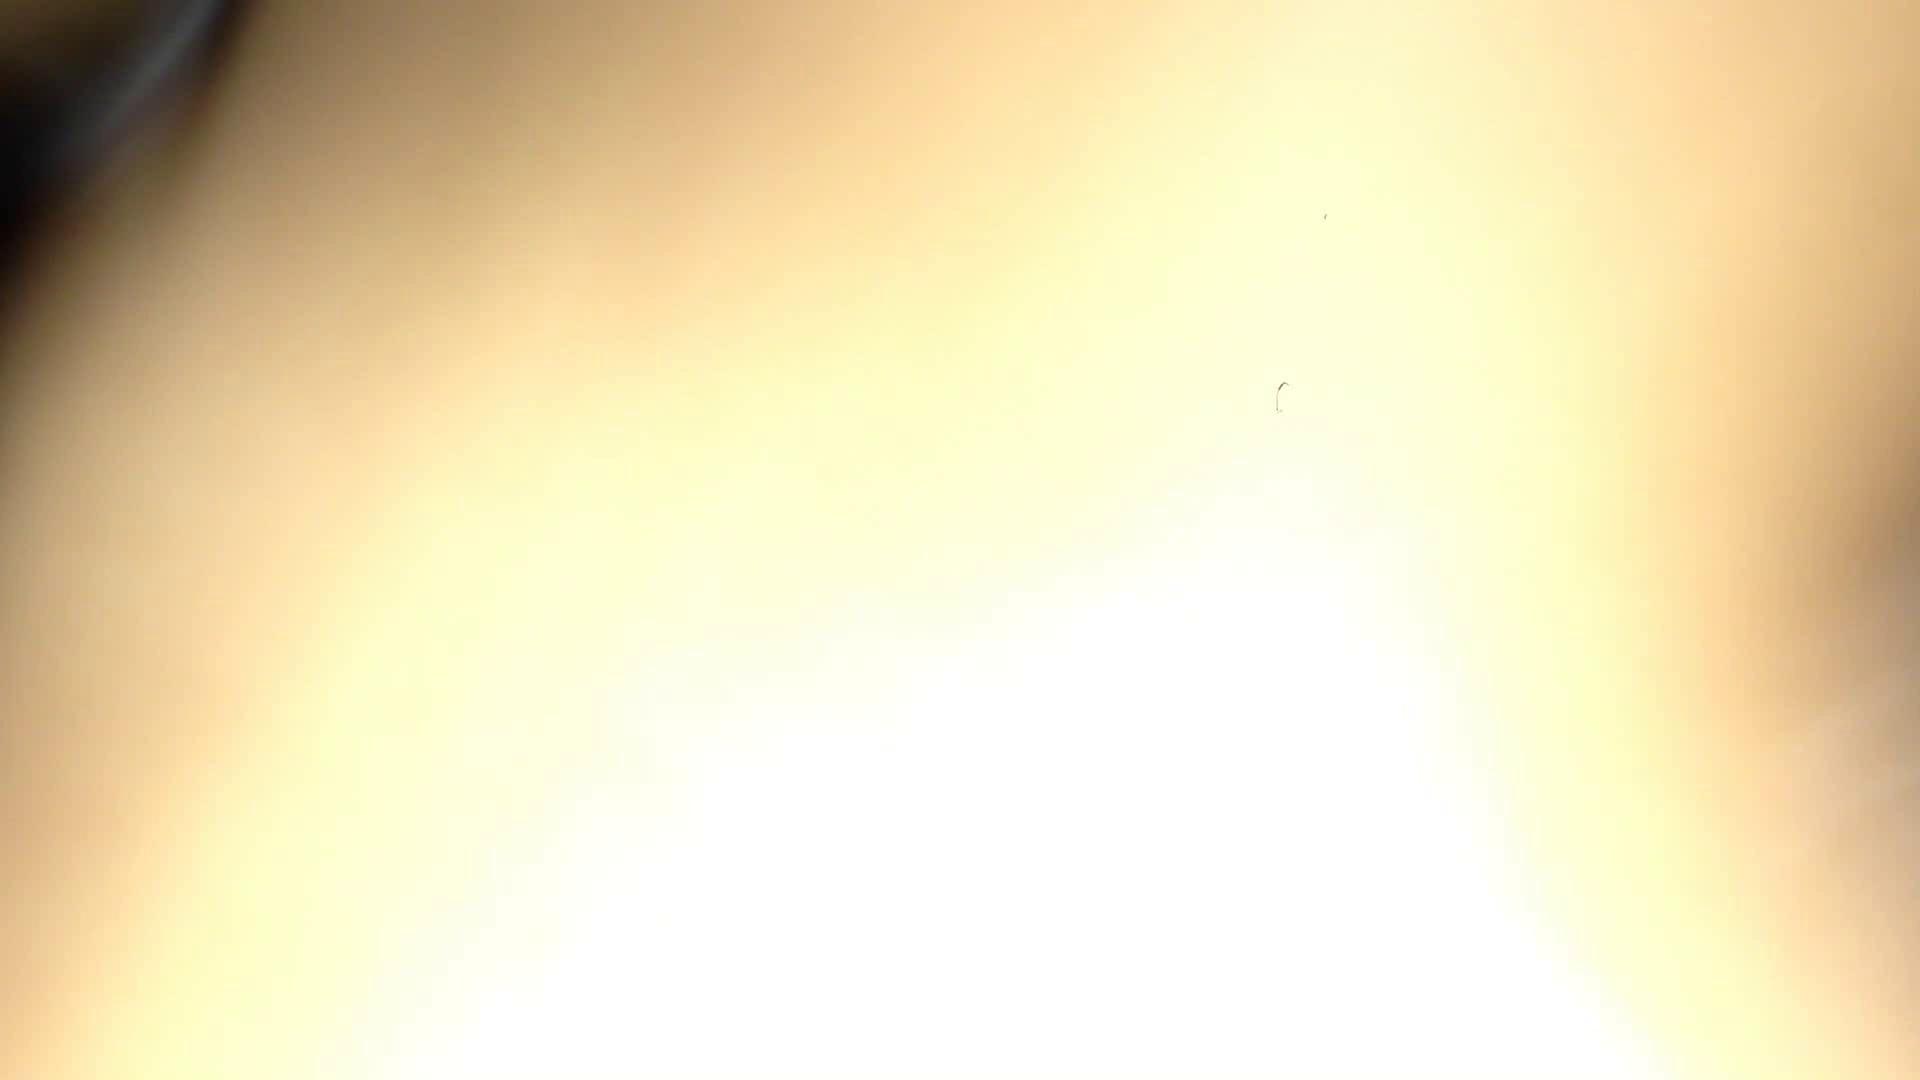 上級者の方専用 vol.11 OL女体  106連発 56